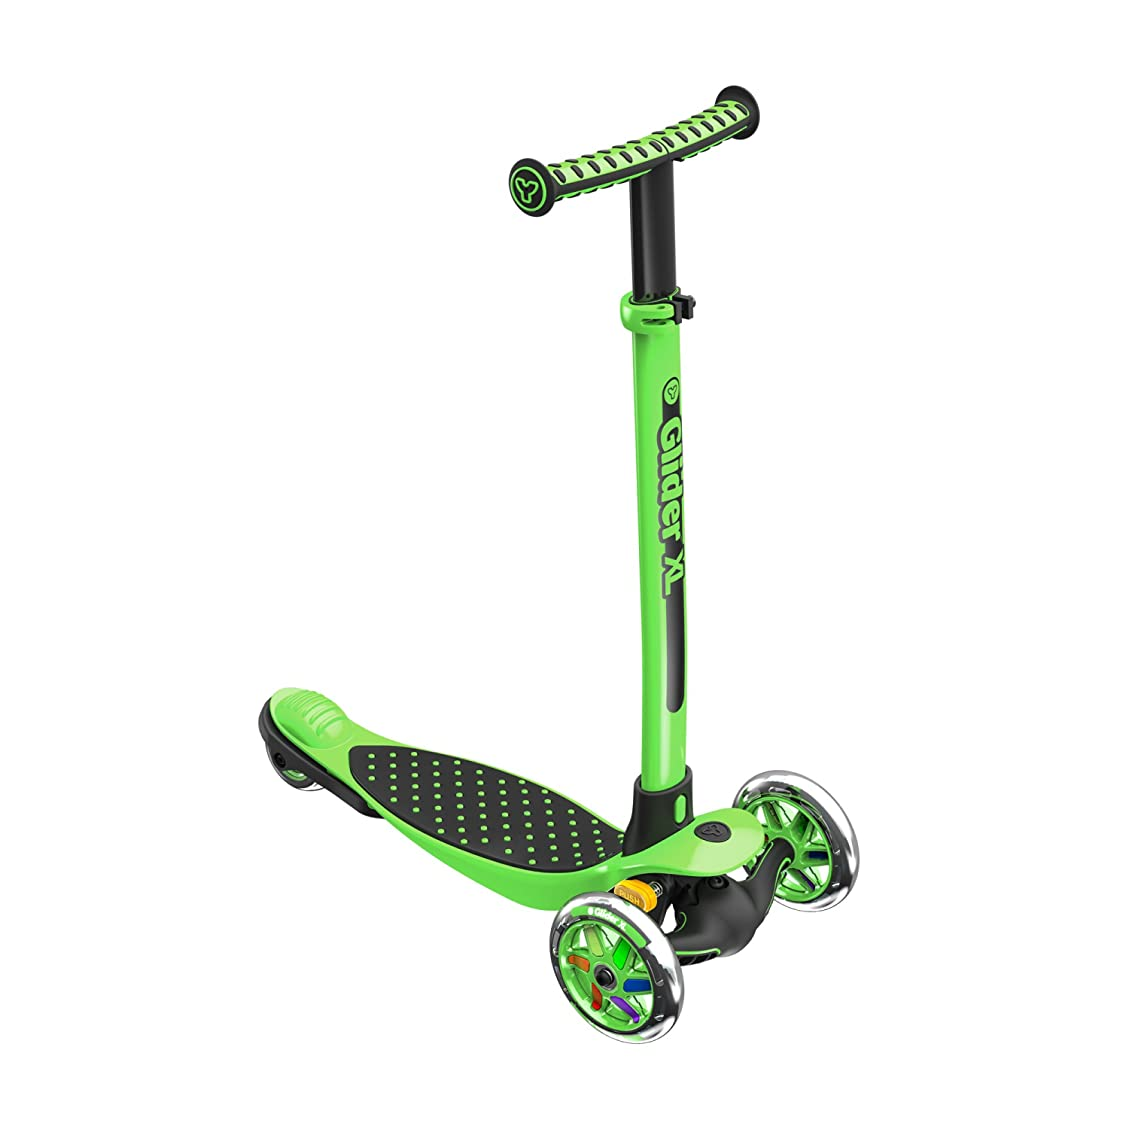 Yvolution Y Glider XL Kids Kick Scooter